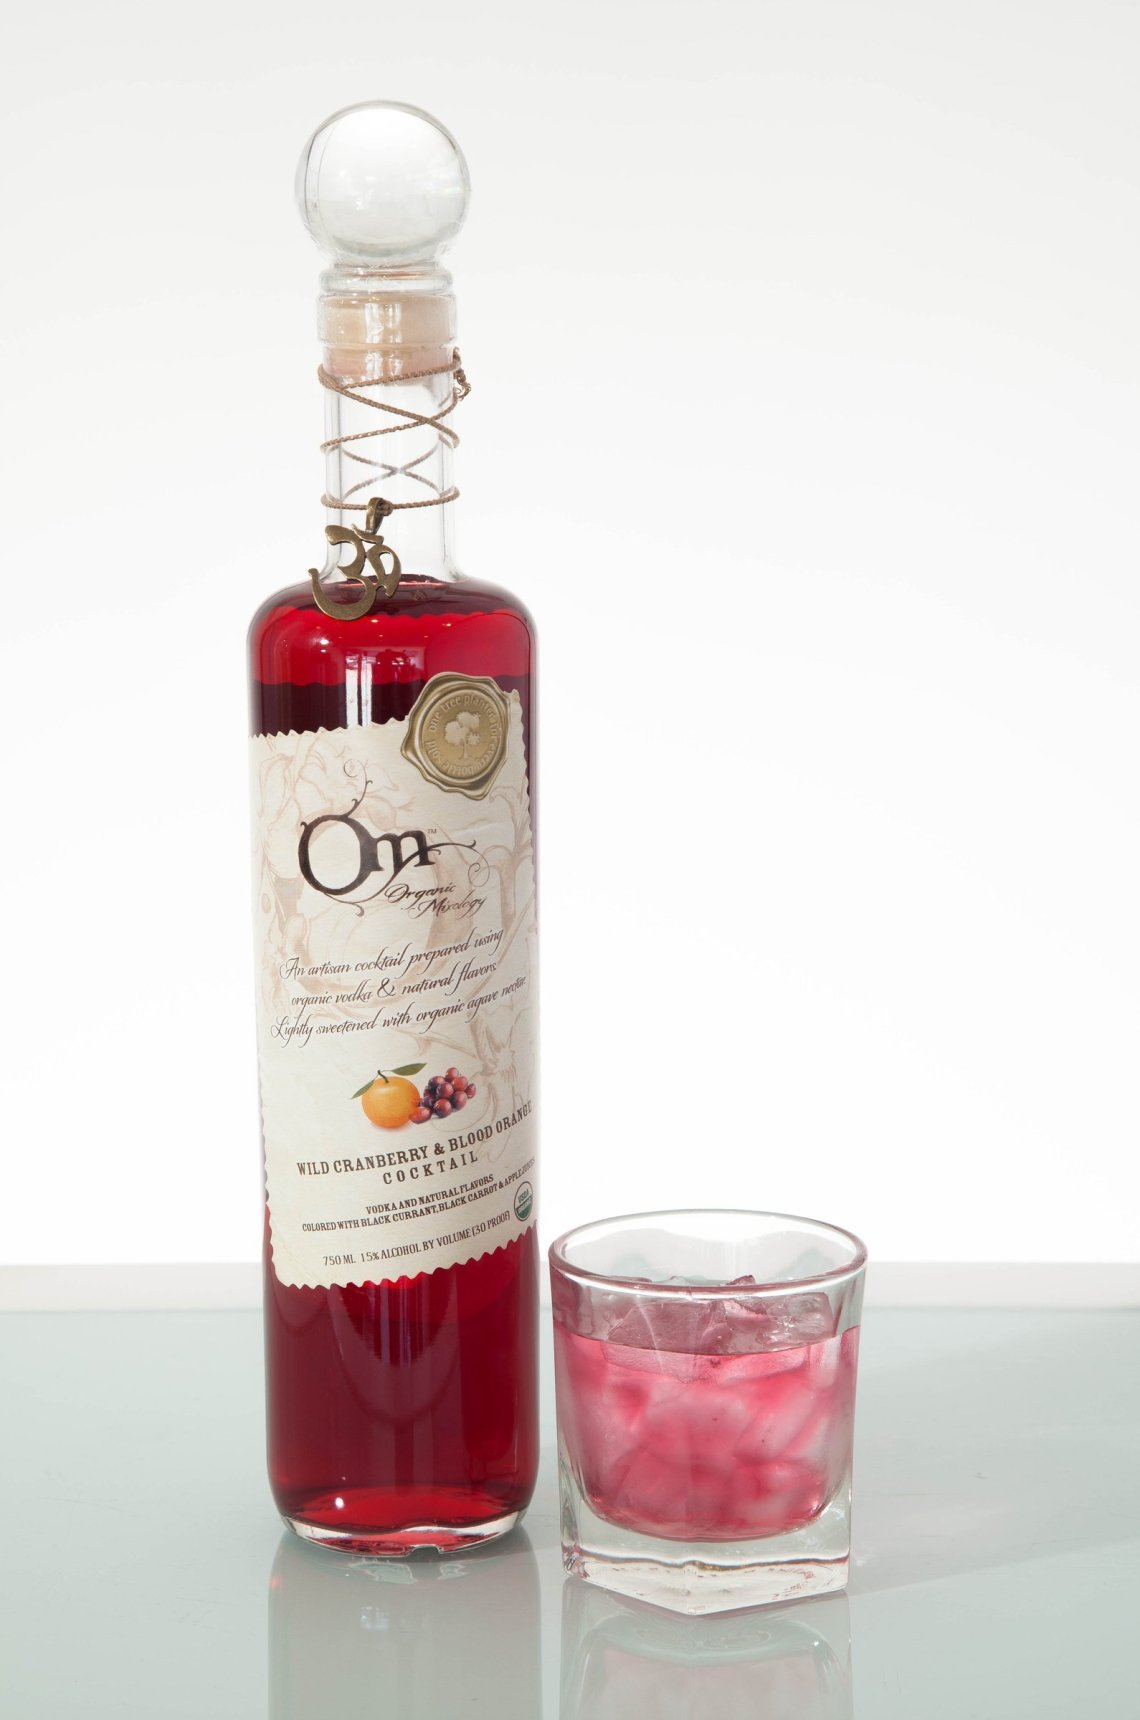 OM Organic Mixology Wild Cranberry & Blood Orange Cocktail